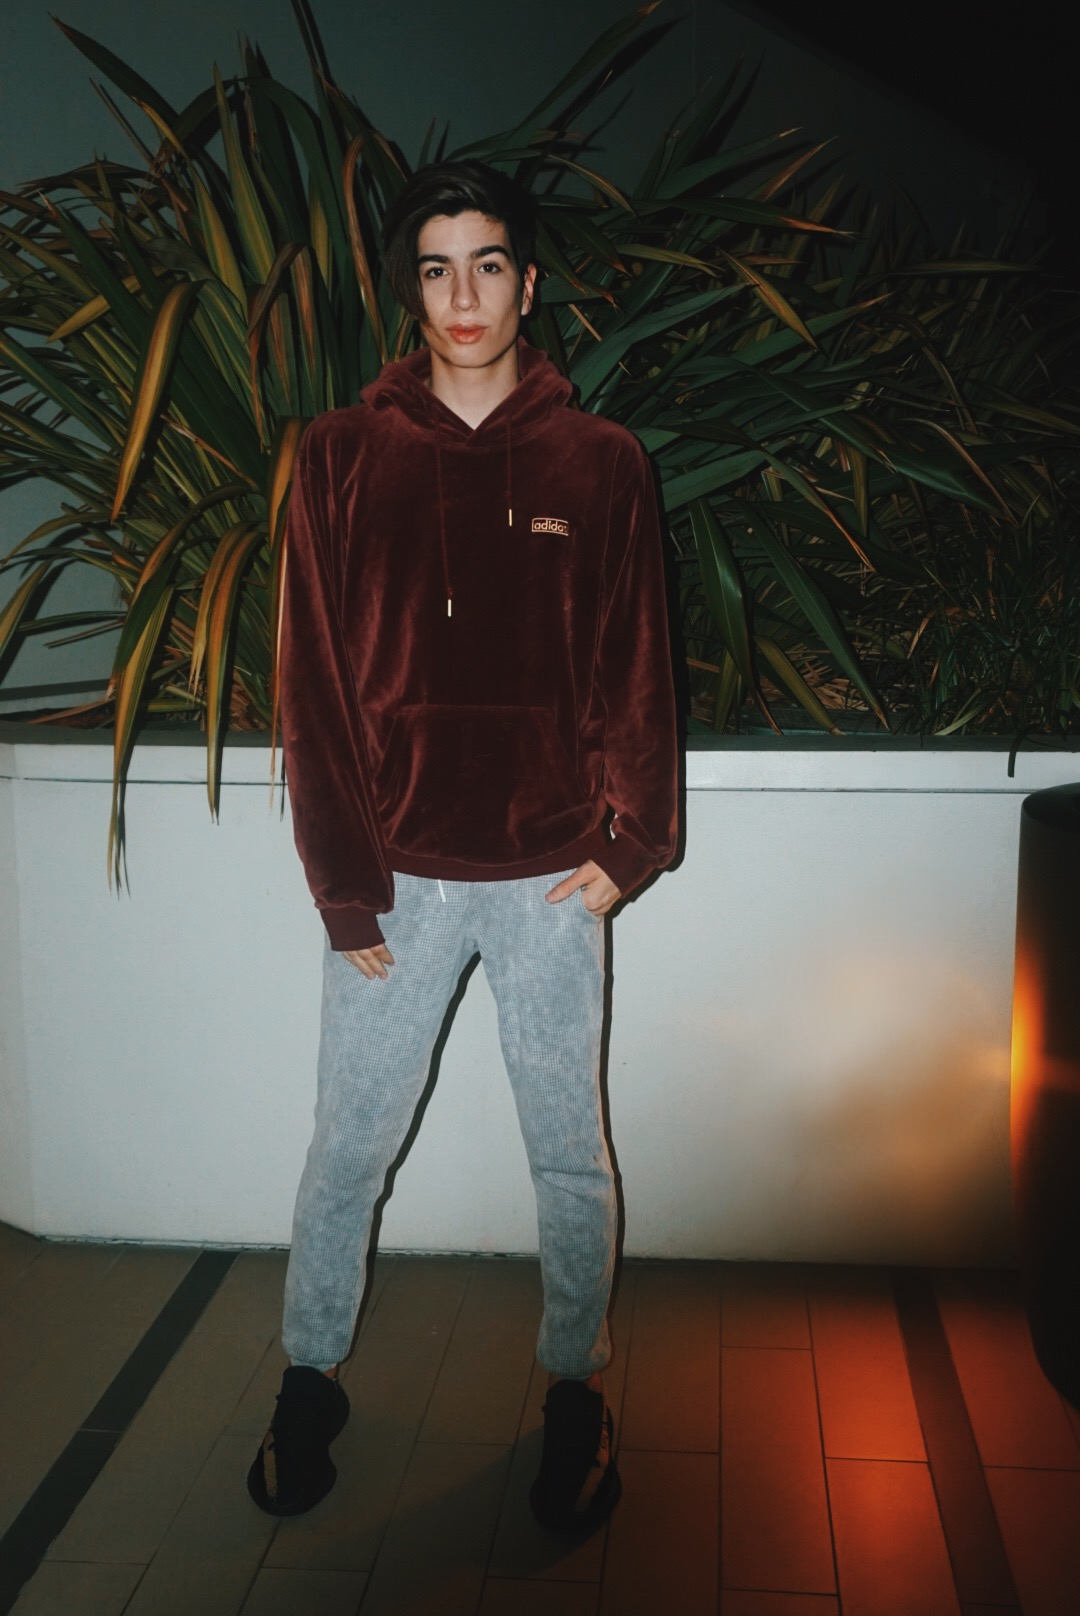 Adidas Velour Hoodie  Cotton Citizen Long Johns  Yeezy Boost